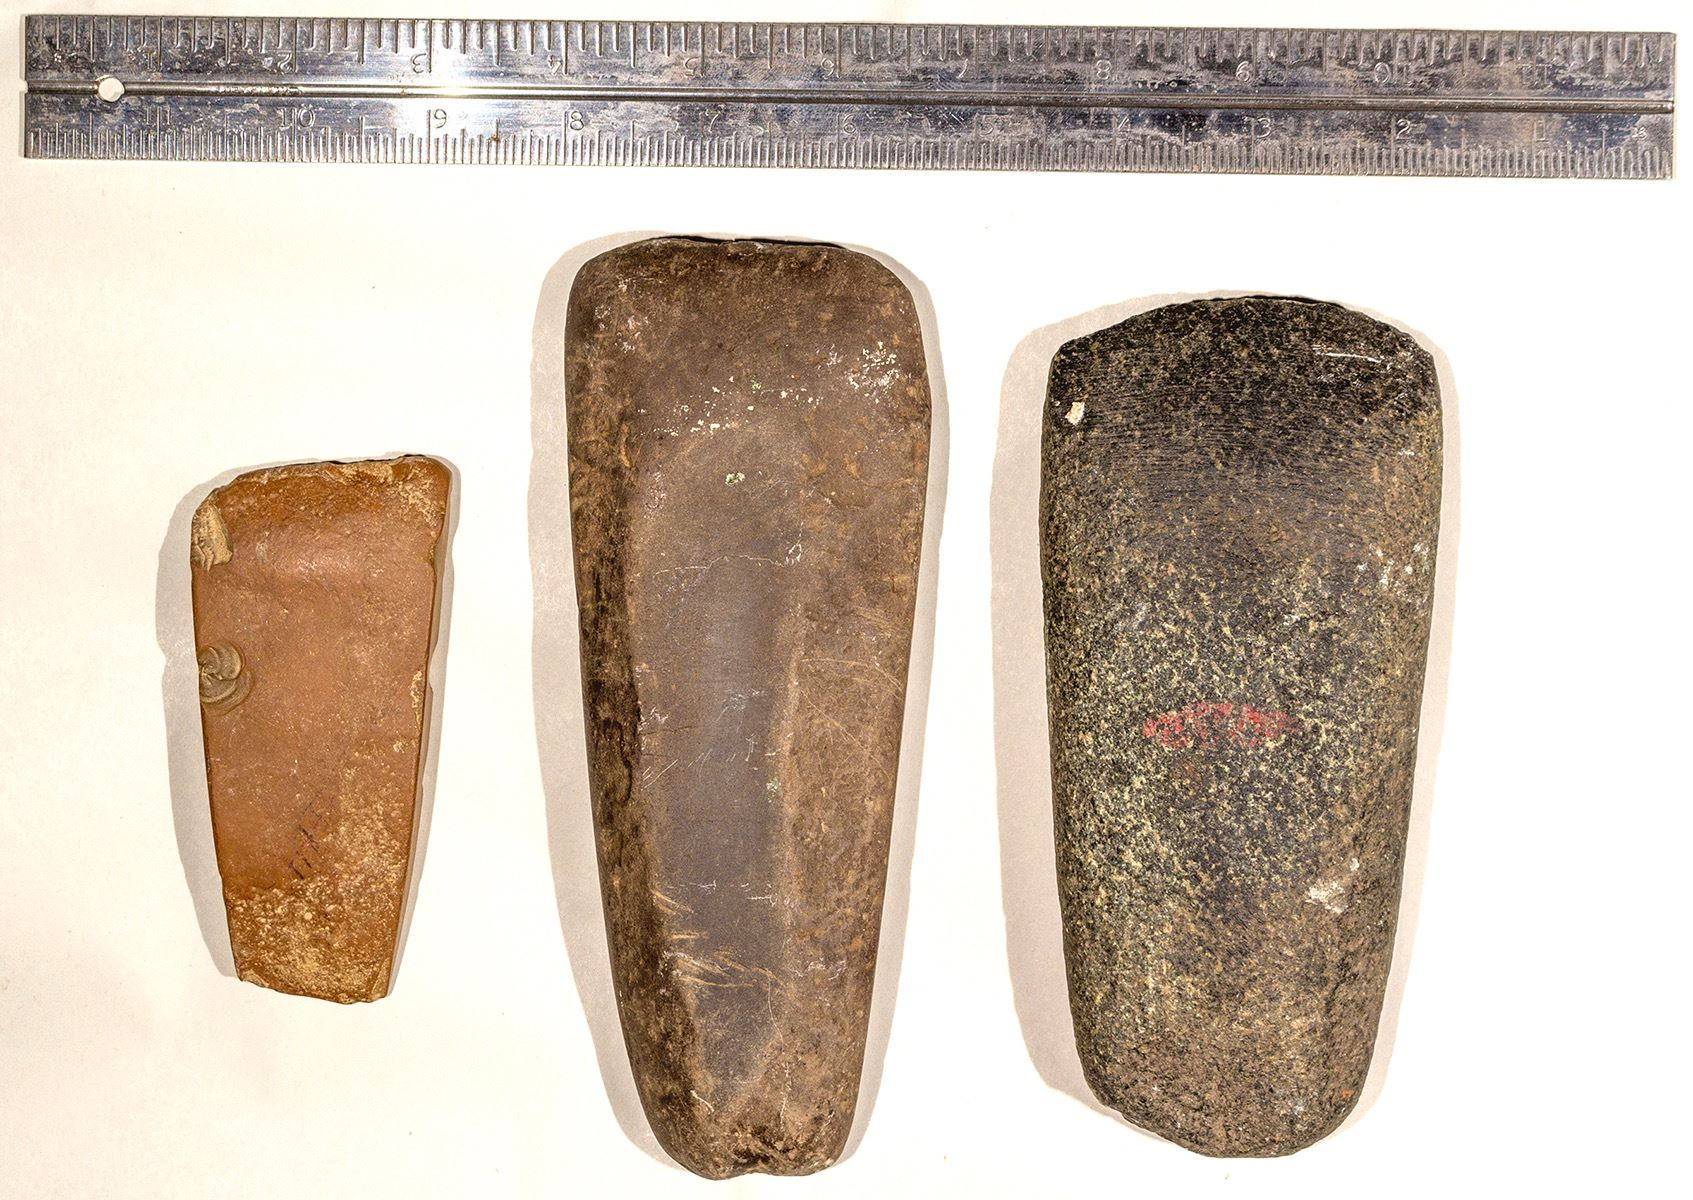 Cherokee Nation Stone Hammers from the Chattahoochee Region